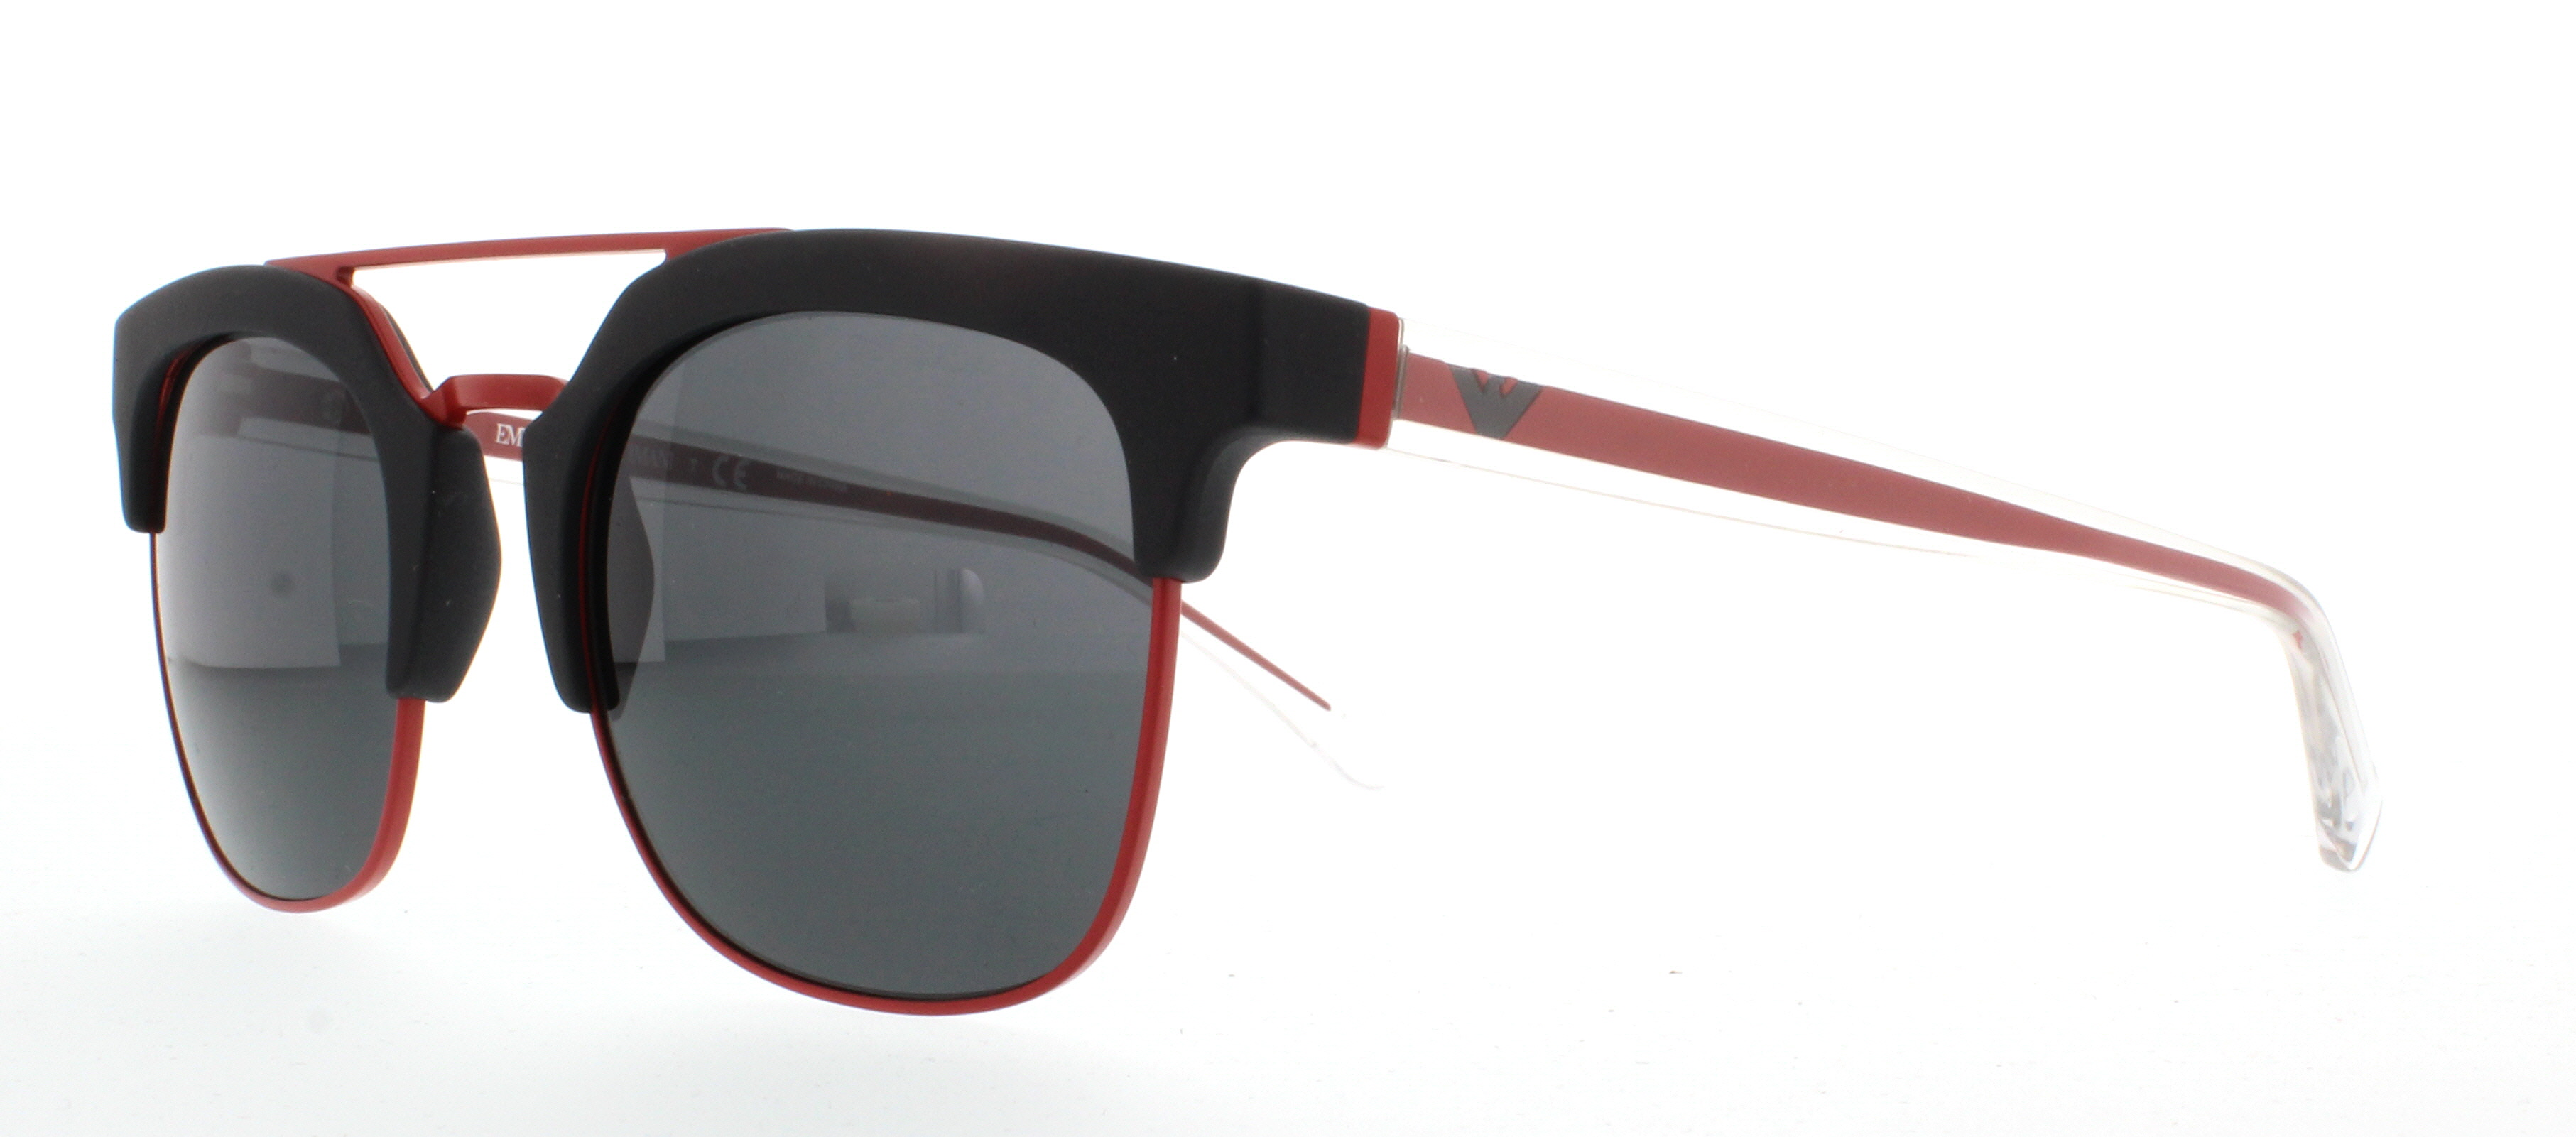 Emporio Armani EA4093 504287 Sonnenbrille Metall AGanfkK